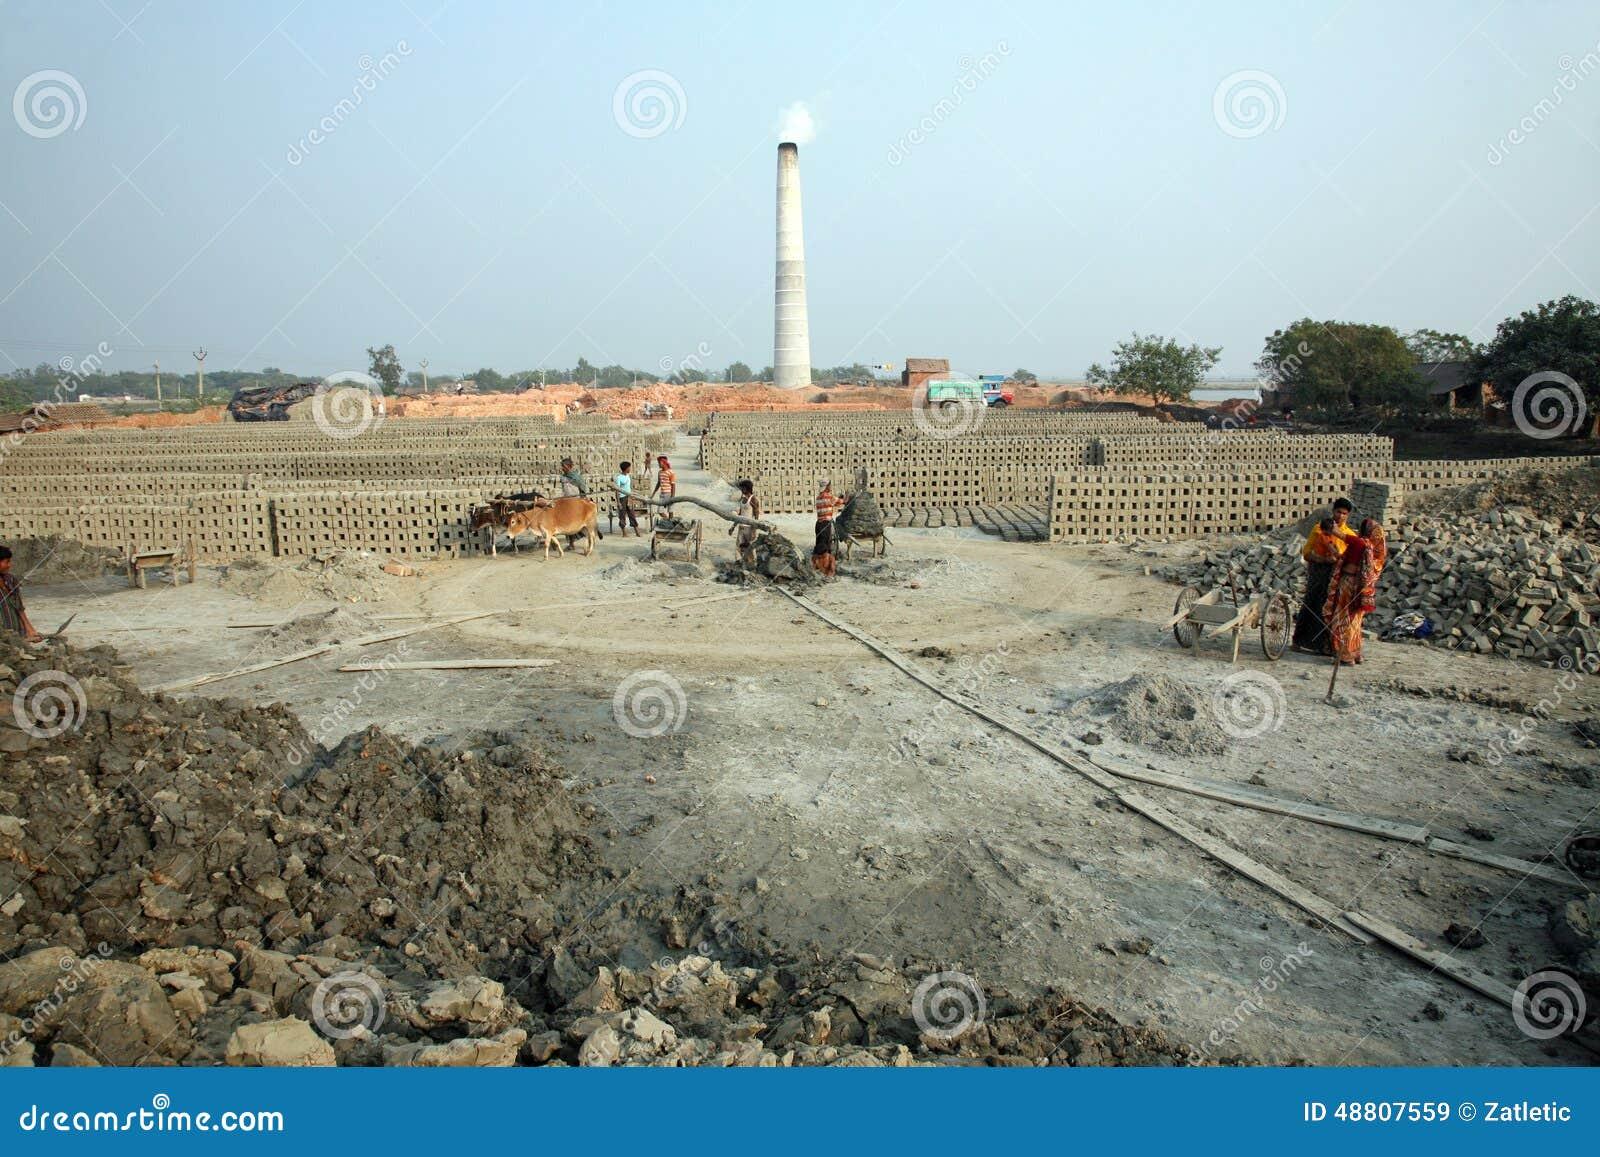 Brickfield in Sarberia, India